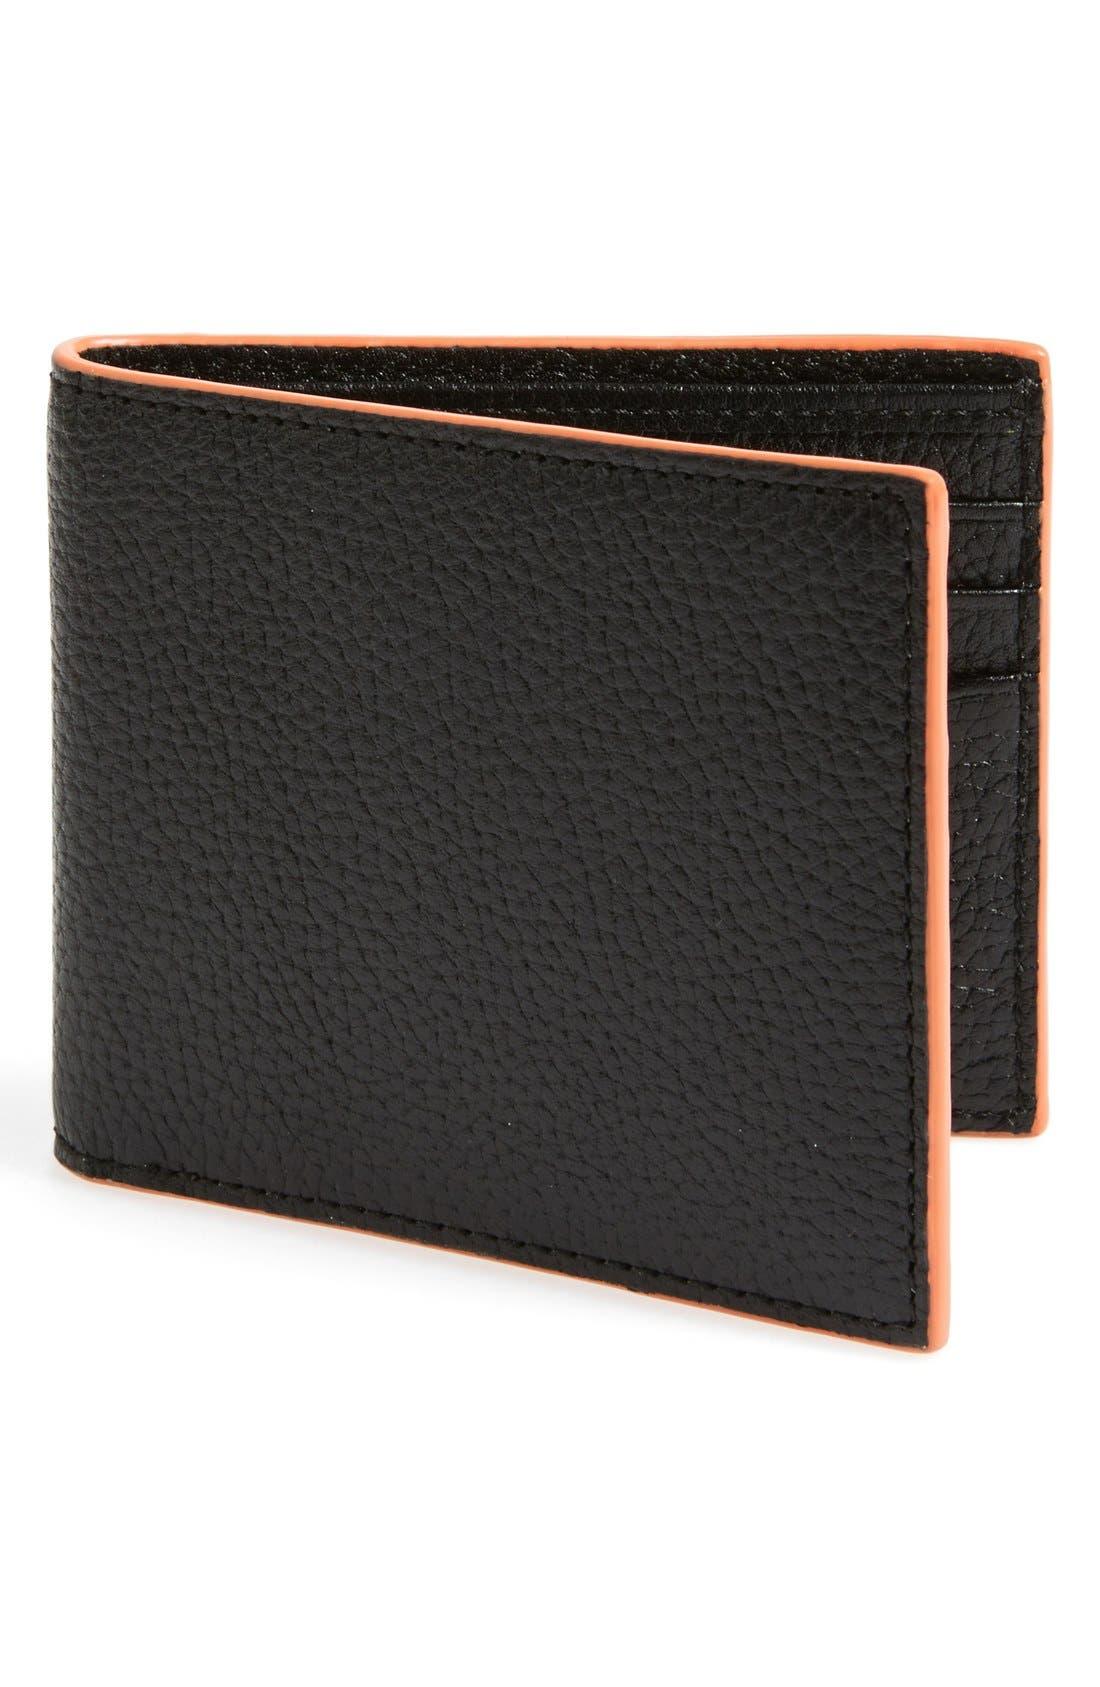 Alternate Image 1 Selected - Jack Spade 'Mason' Leather Wallet